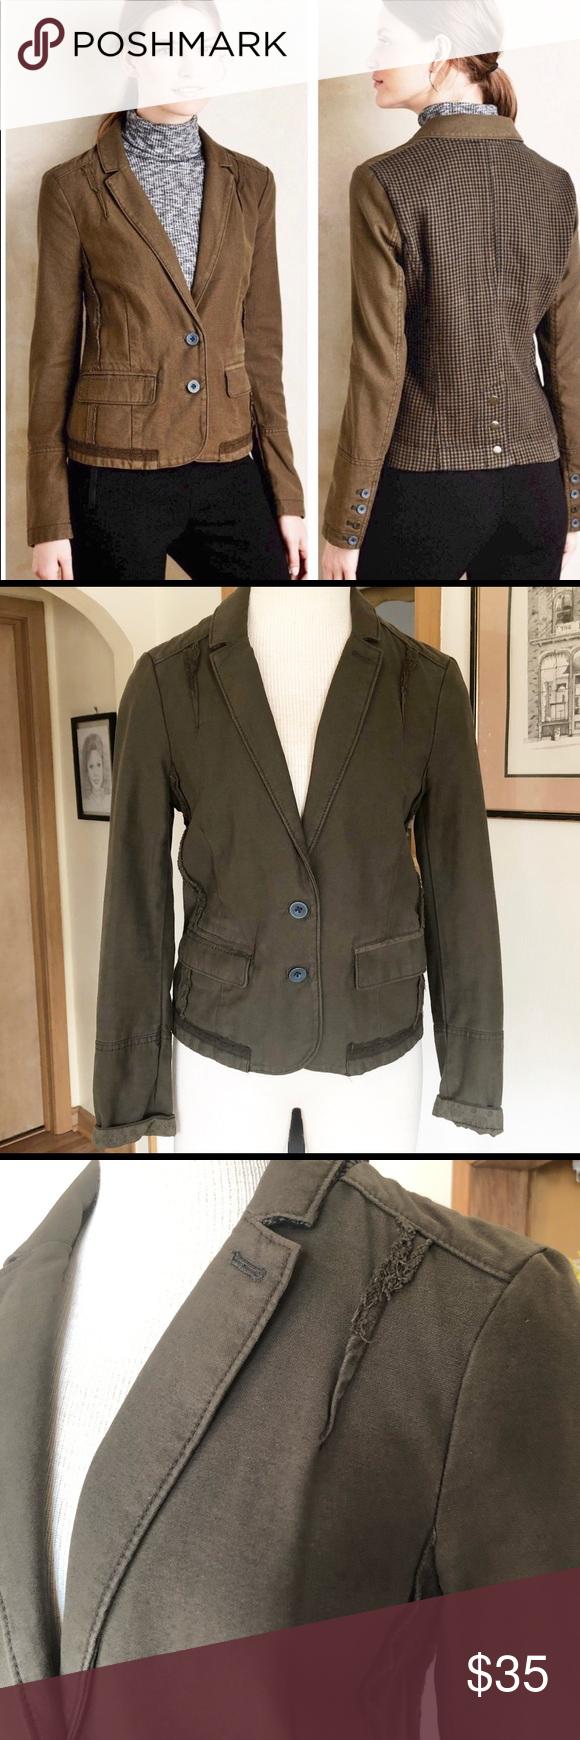 Anthropologie Hei Hei Delanie Blazer UK 8 Olive green/true khaki color and navy …